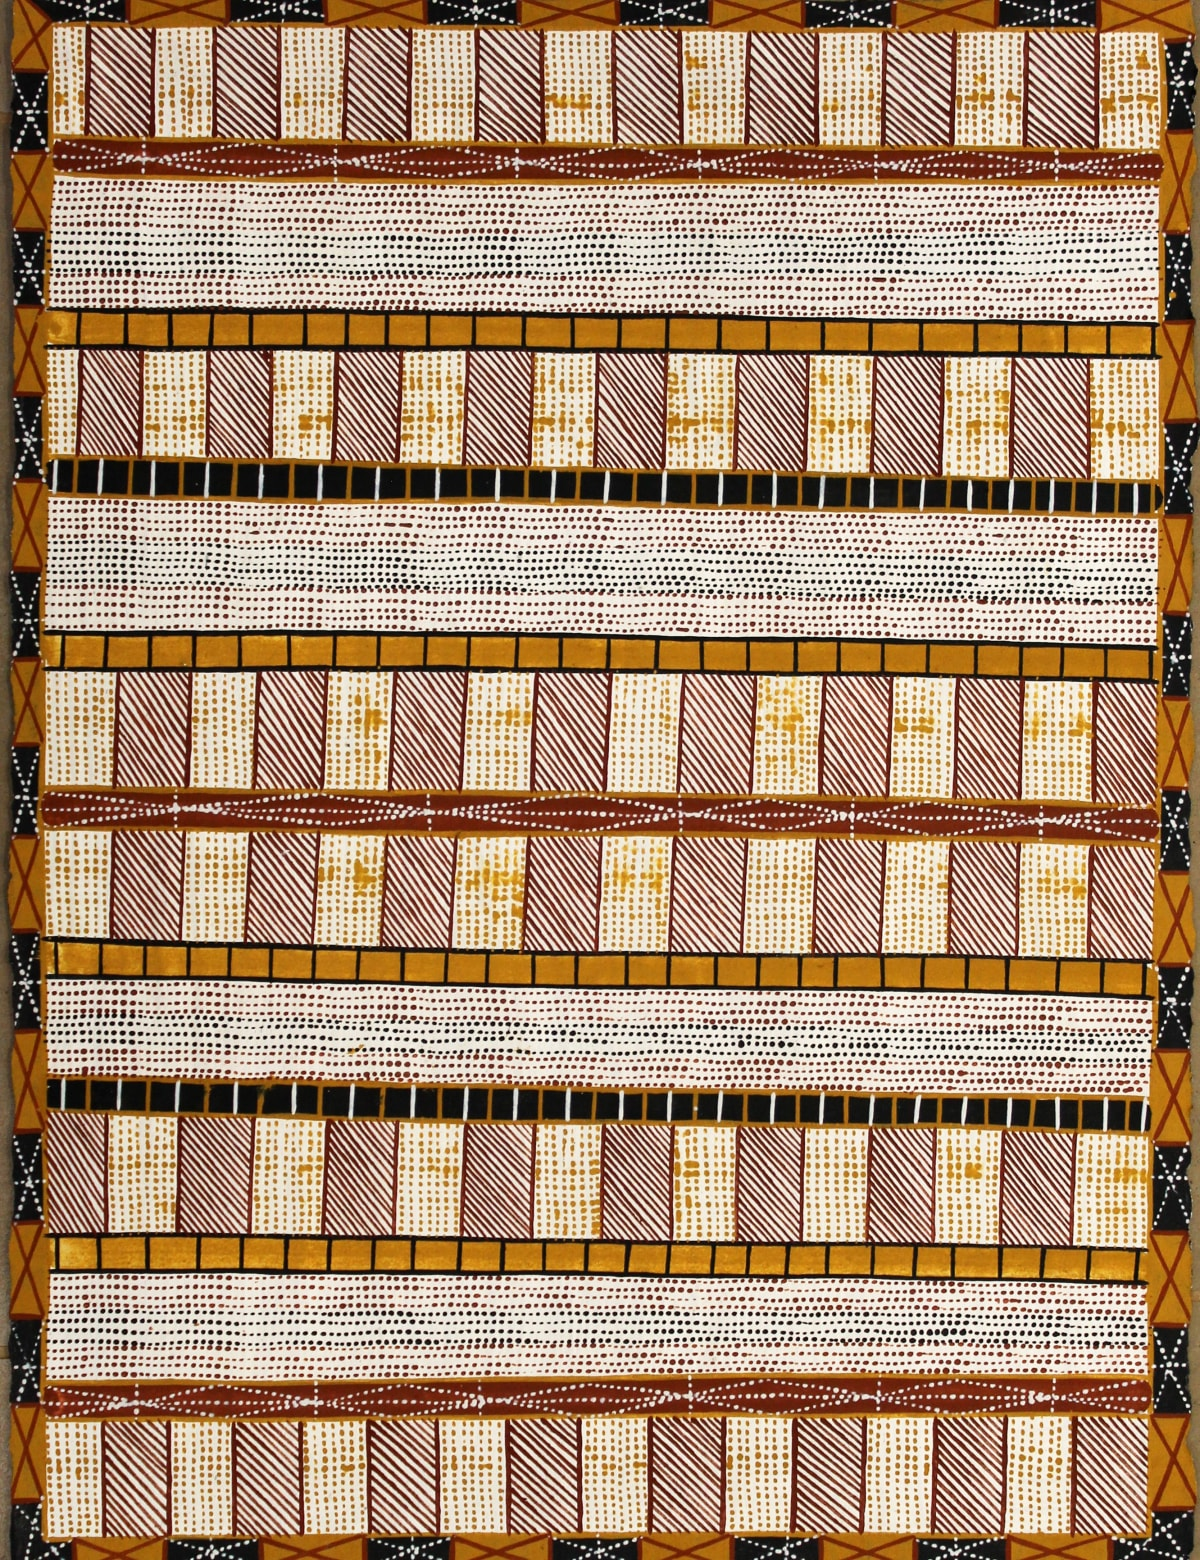 Pedro Wonaeamirri Jilamara ochre on paper 56 x 76 cm